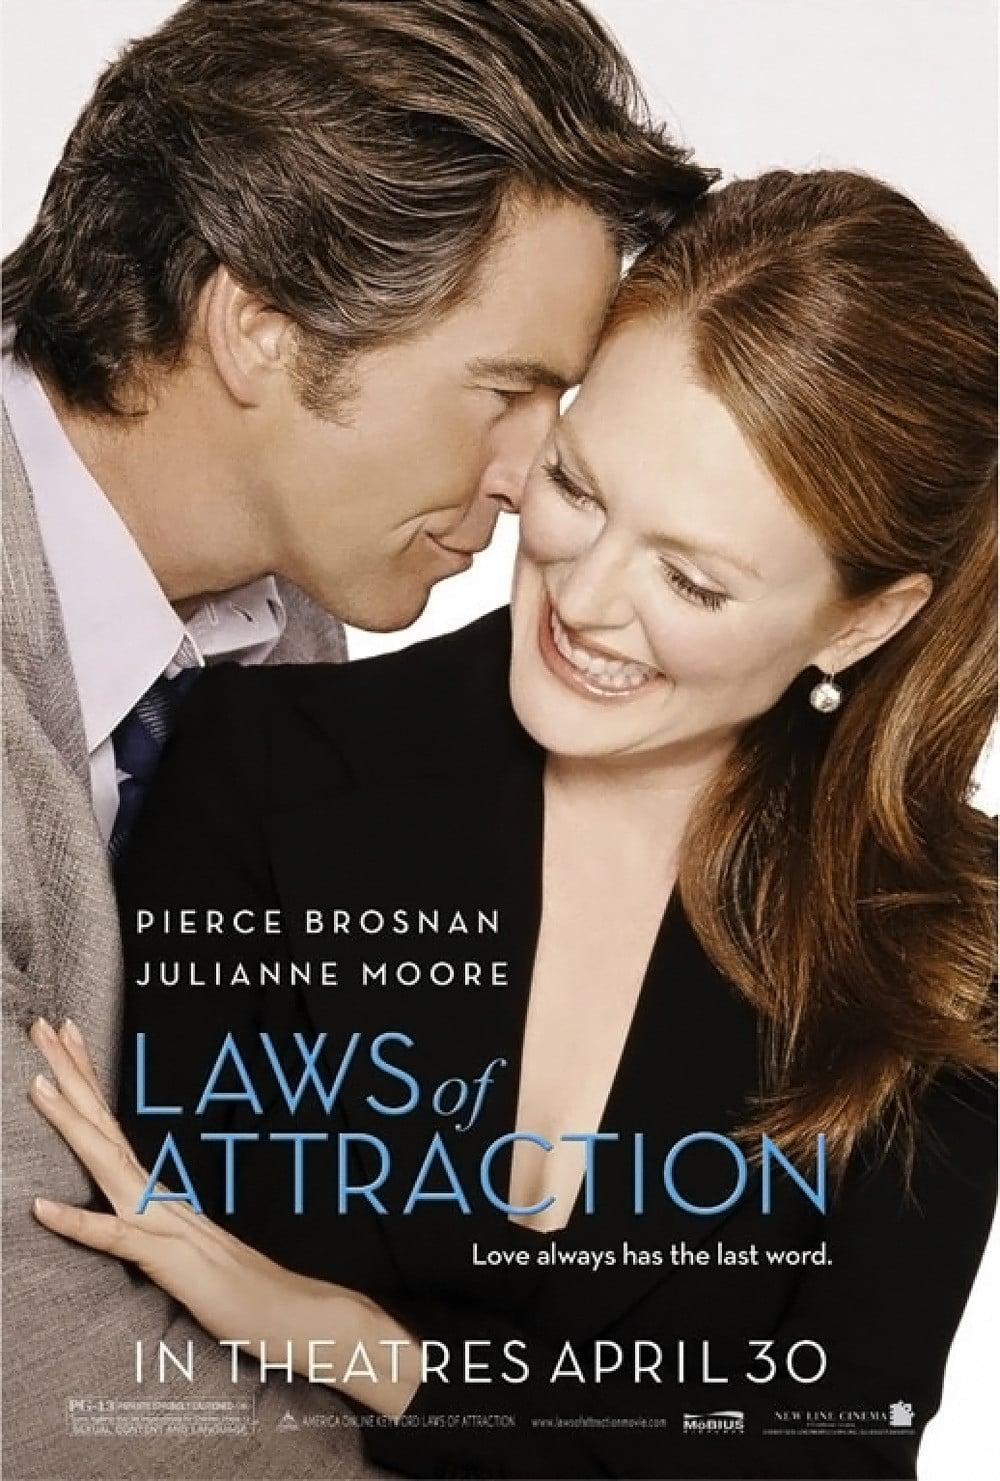 Matrimonio In Appello : Laws of attraction matrimonio in appello